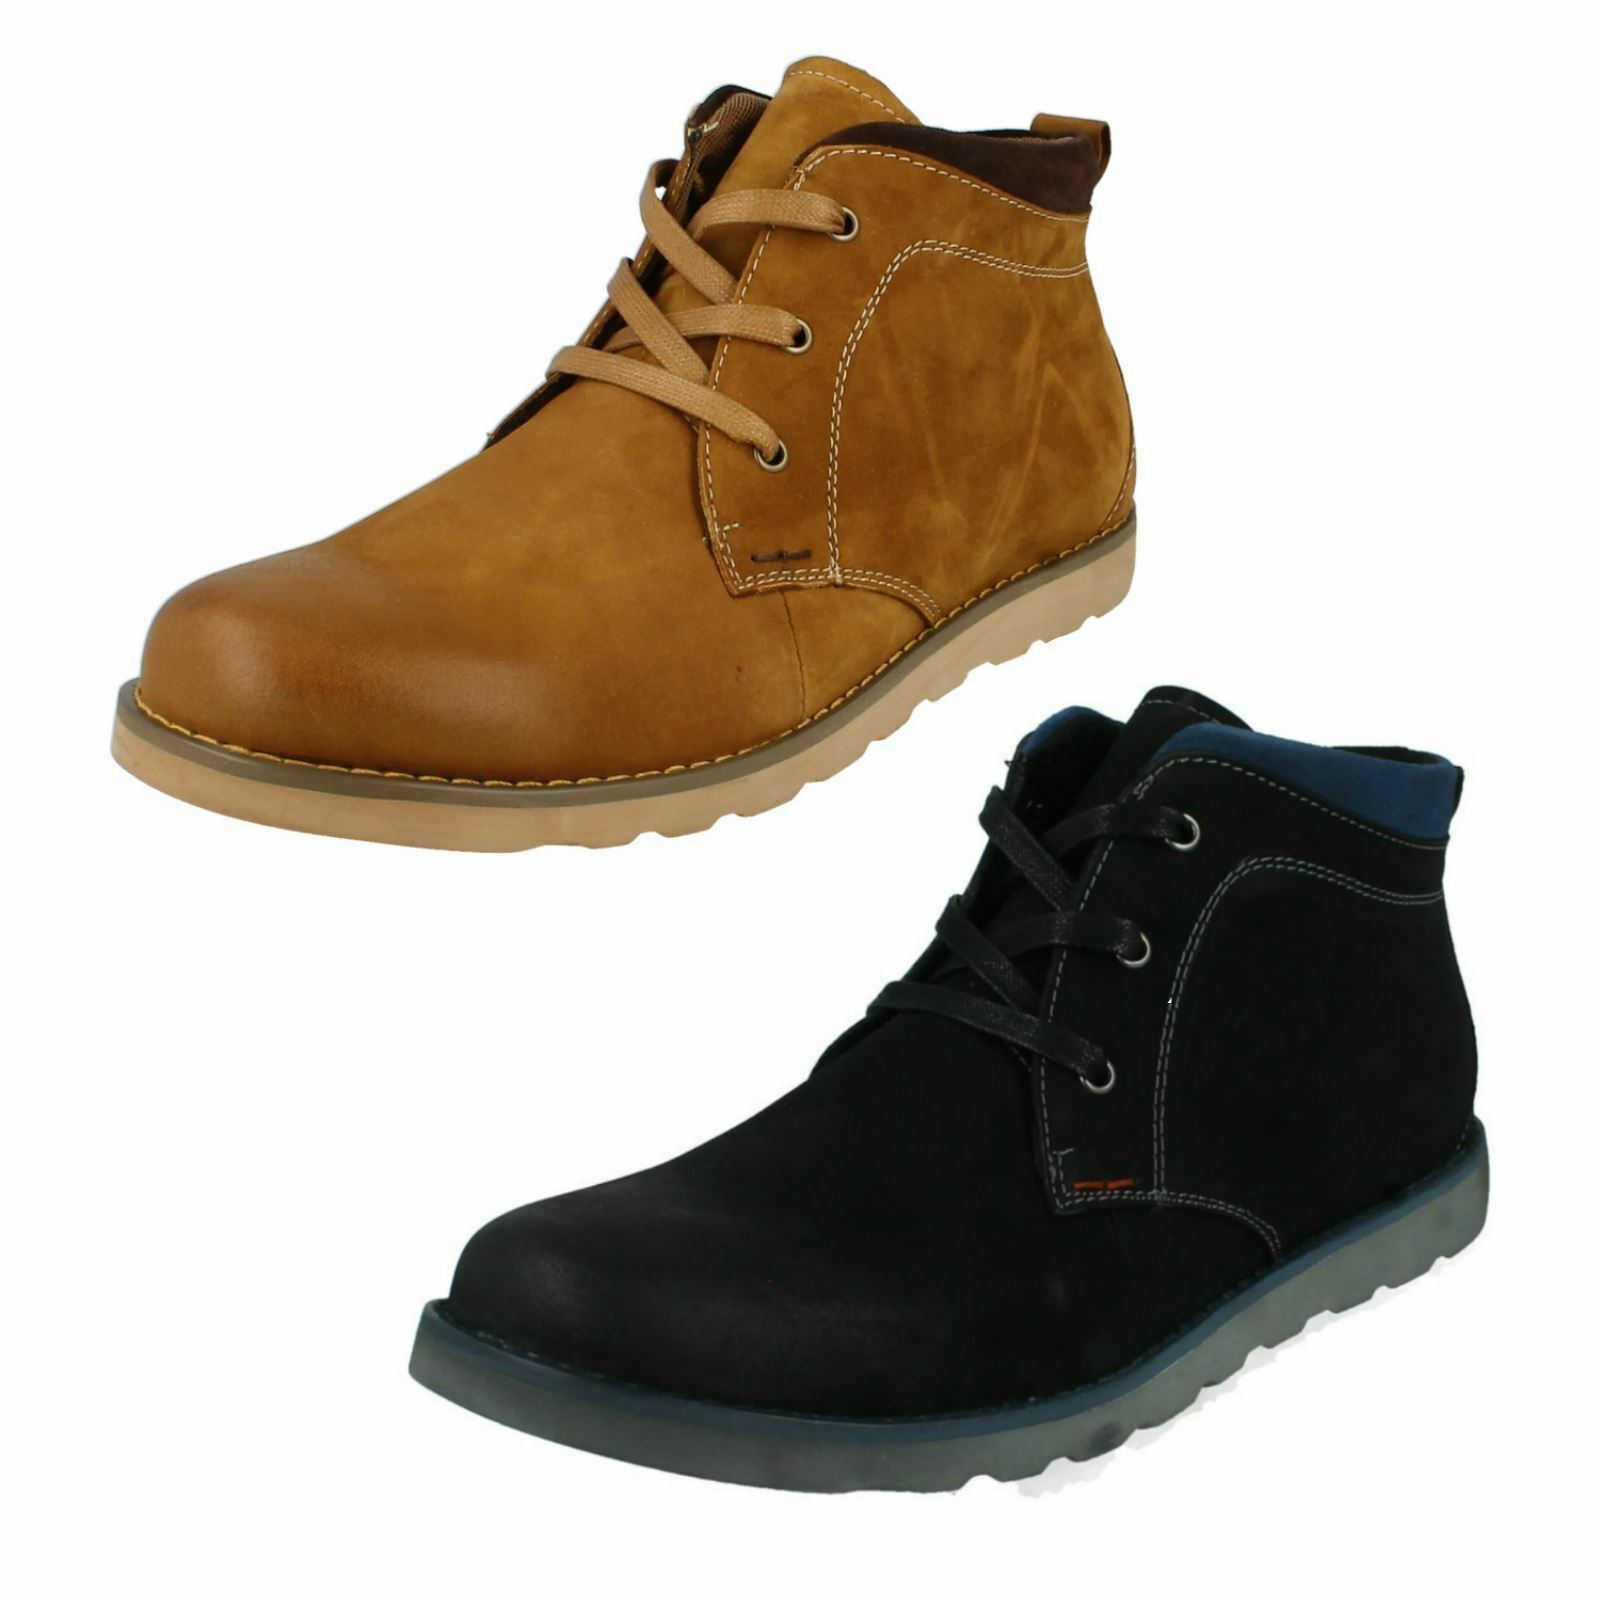 Ausverkauf Thomas Blunt formal-mens schwarz / hellbraunes Leder boots-a3056